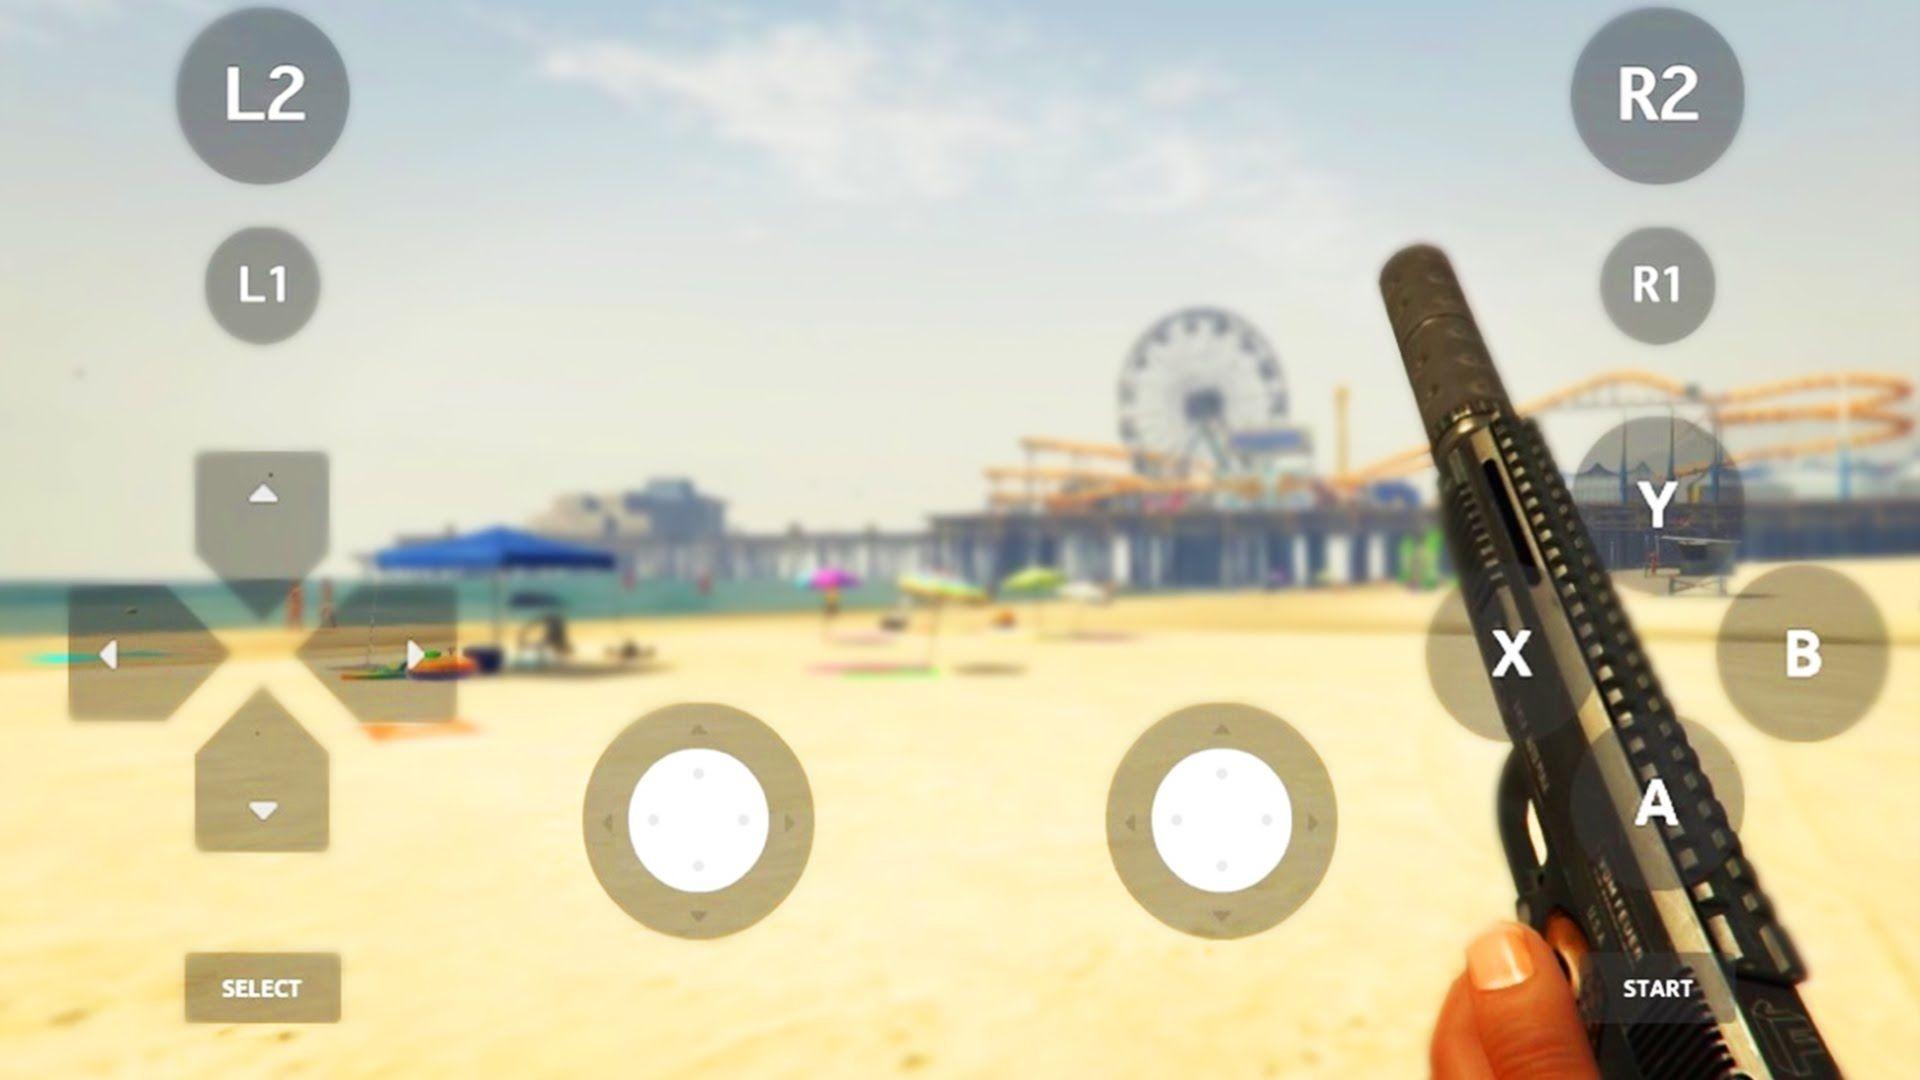 Gta V Wallpaper Iphone 5 Beautiful Play Grand Theft - Gta 5 Iphone Play , HD Wallpaper & Backgrounds